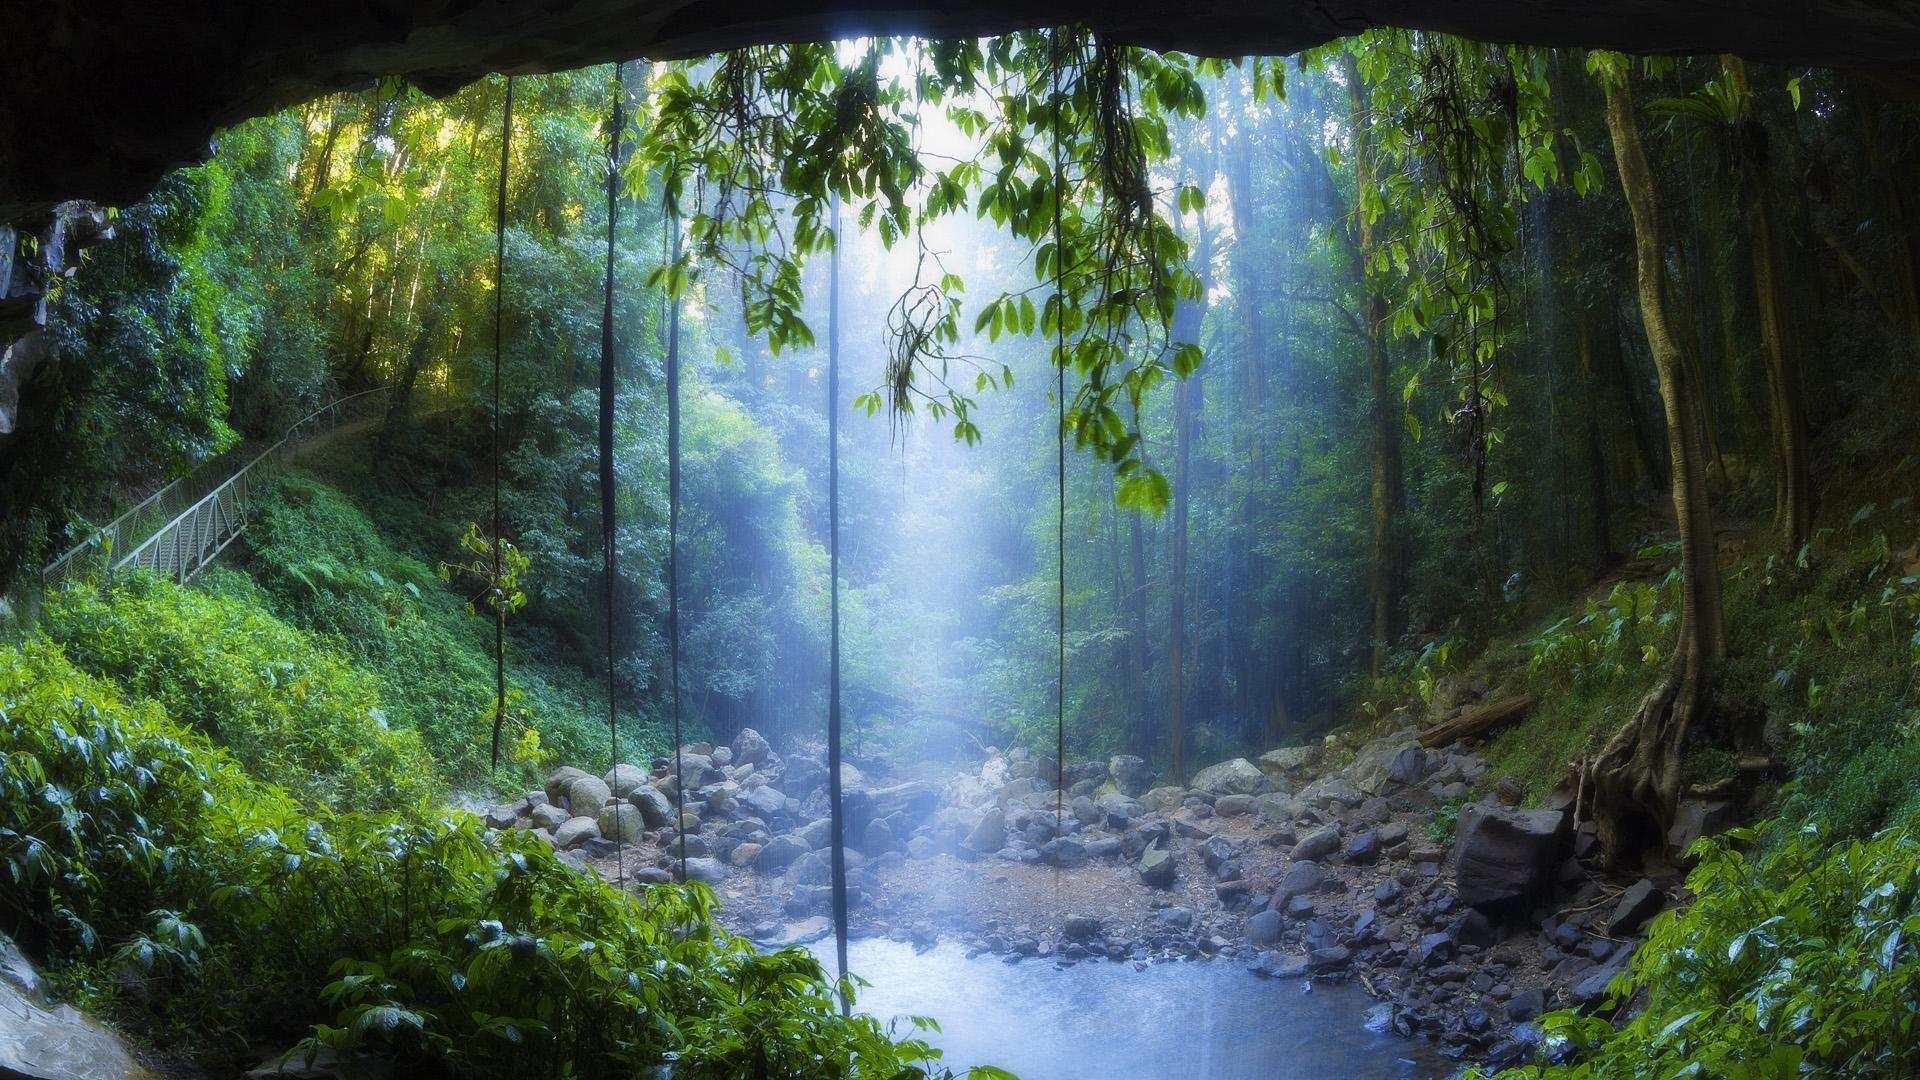 [73+] Tropical Rainforest Wallpaper on WallpaperSafari